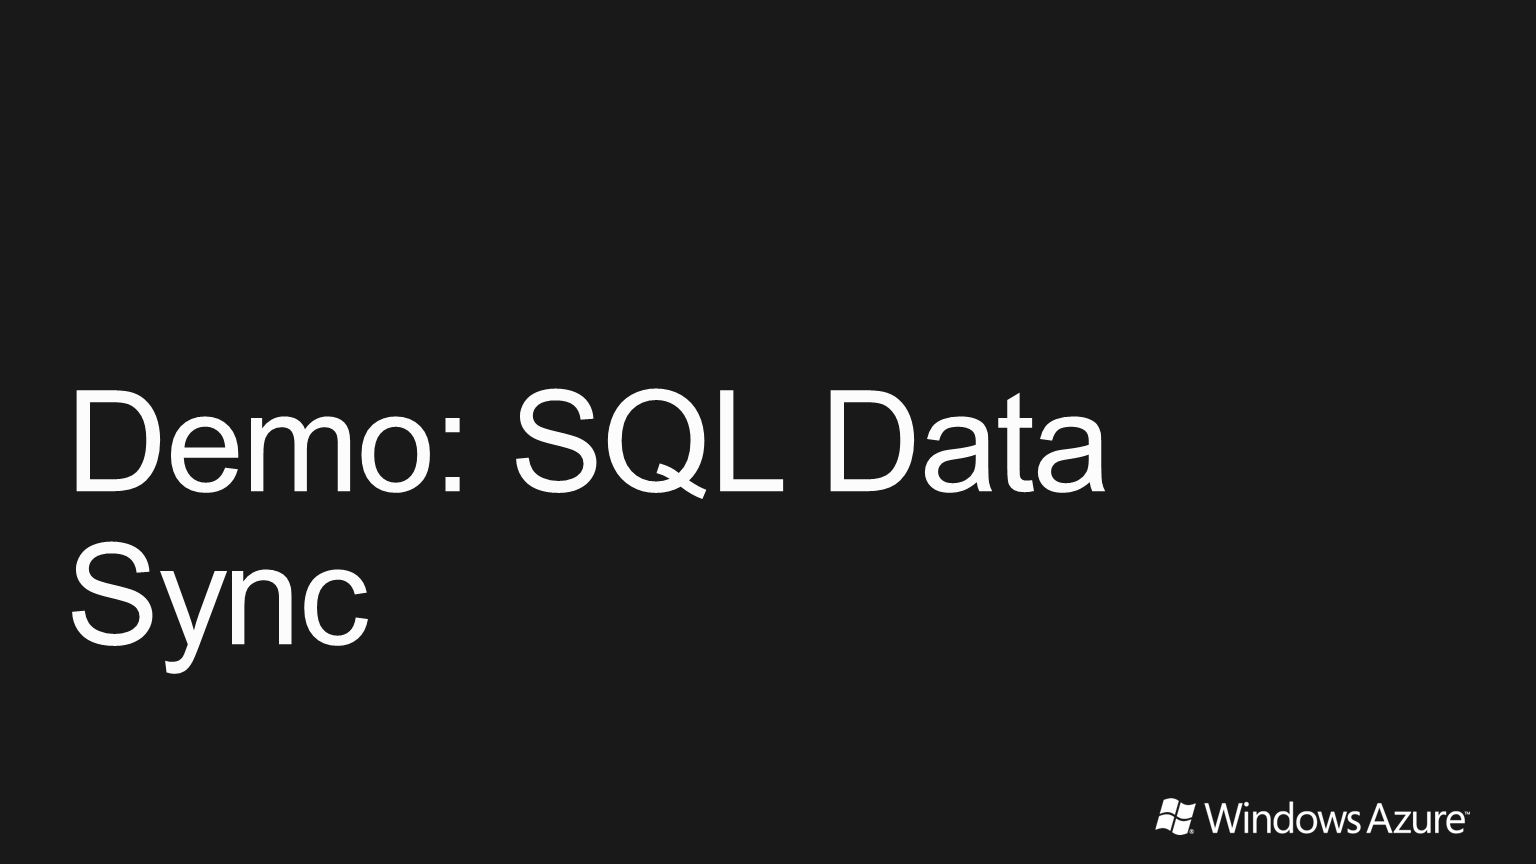 Demo: SQL Data Sync